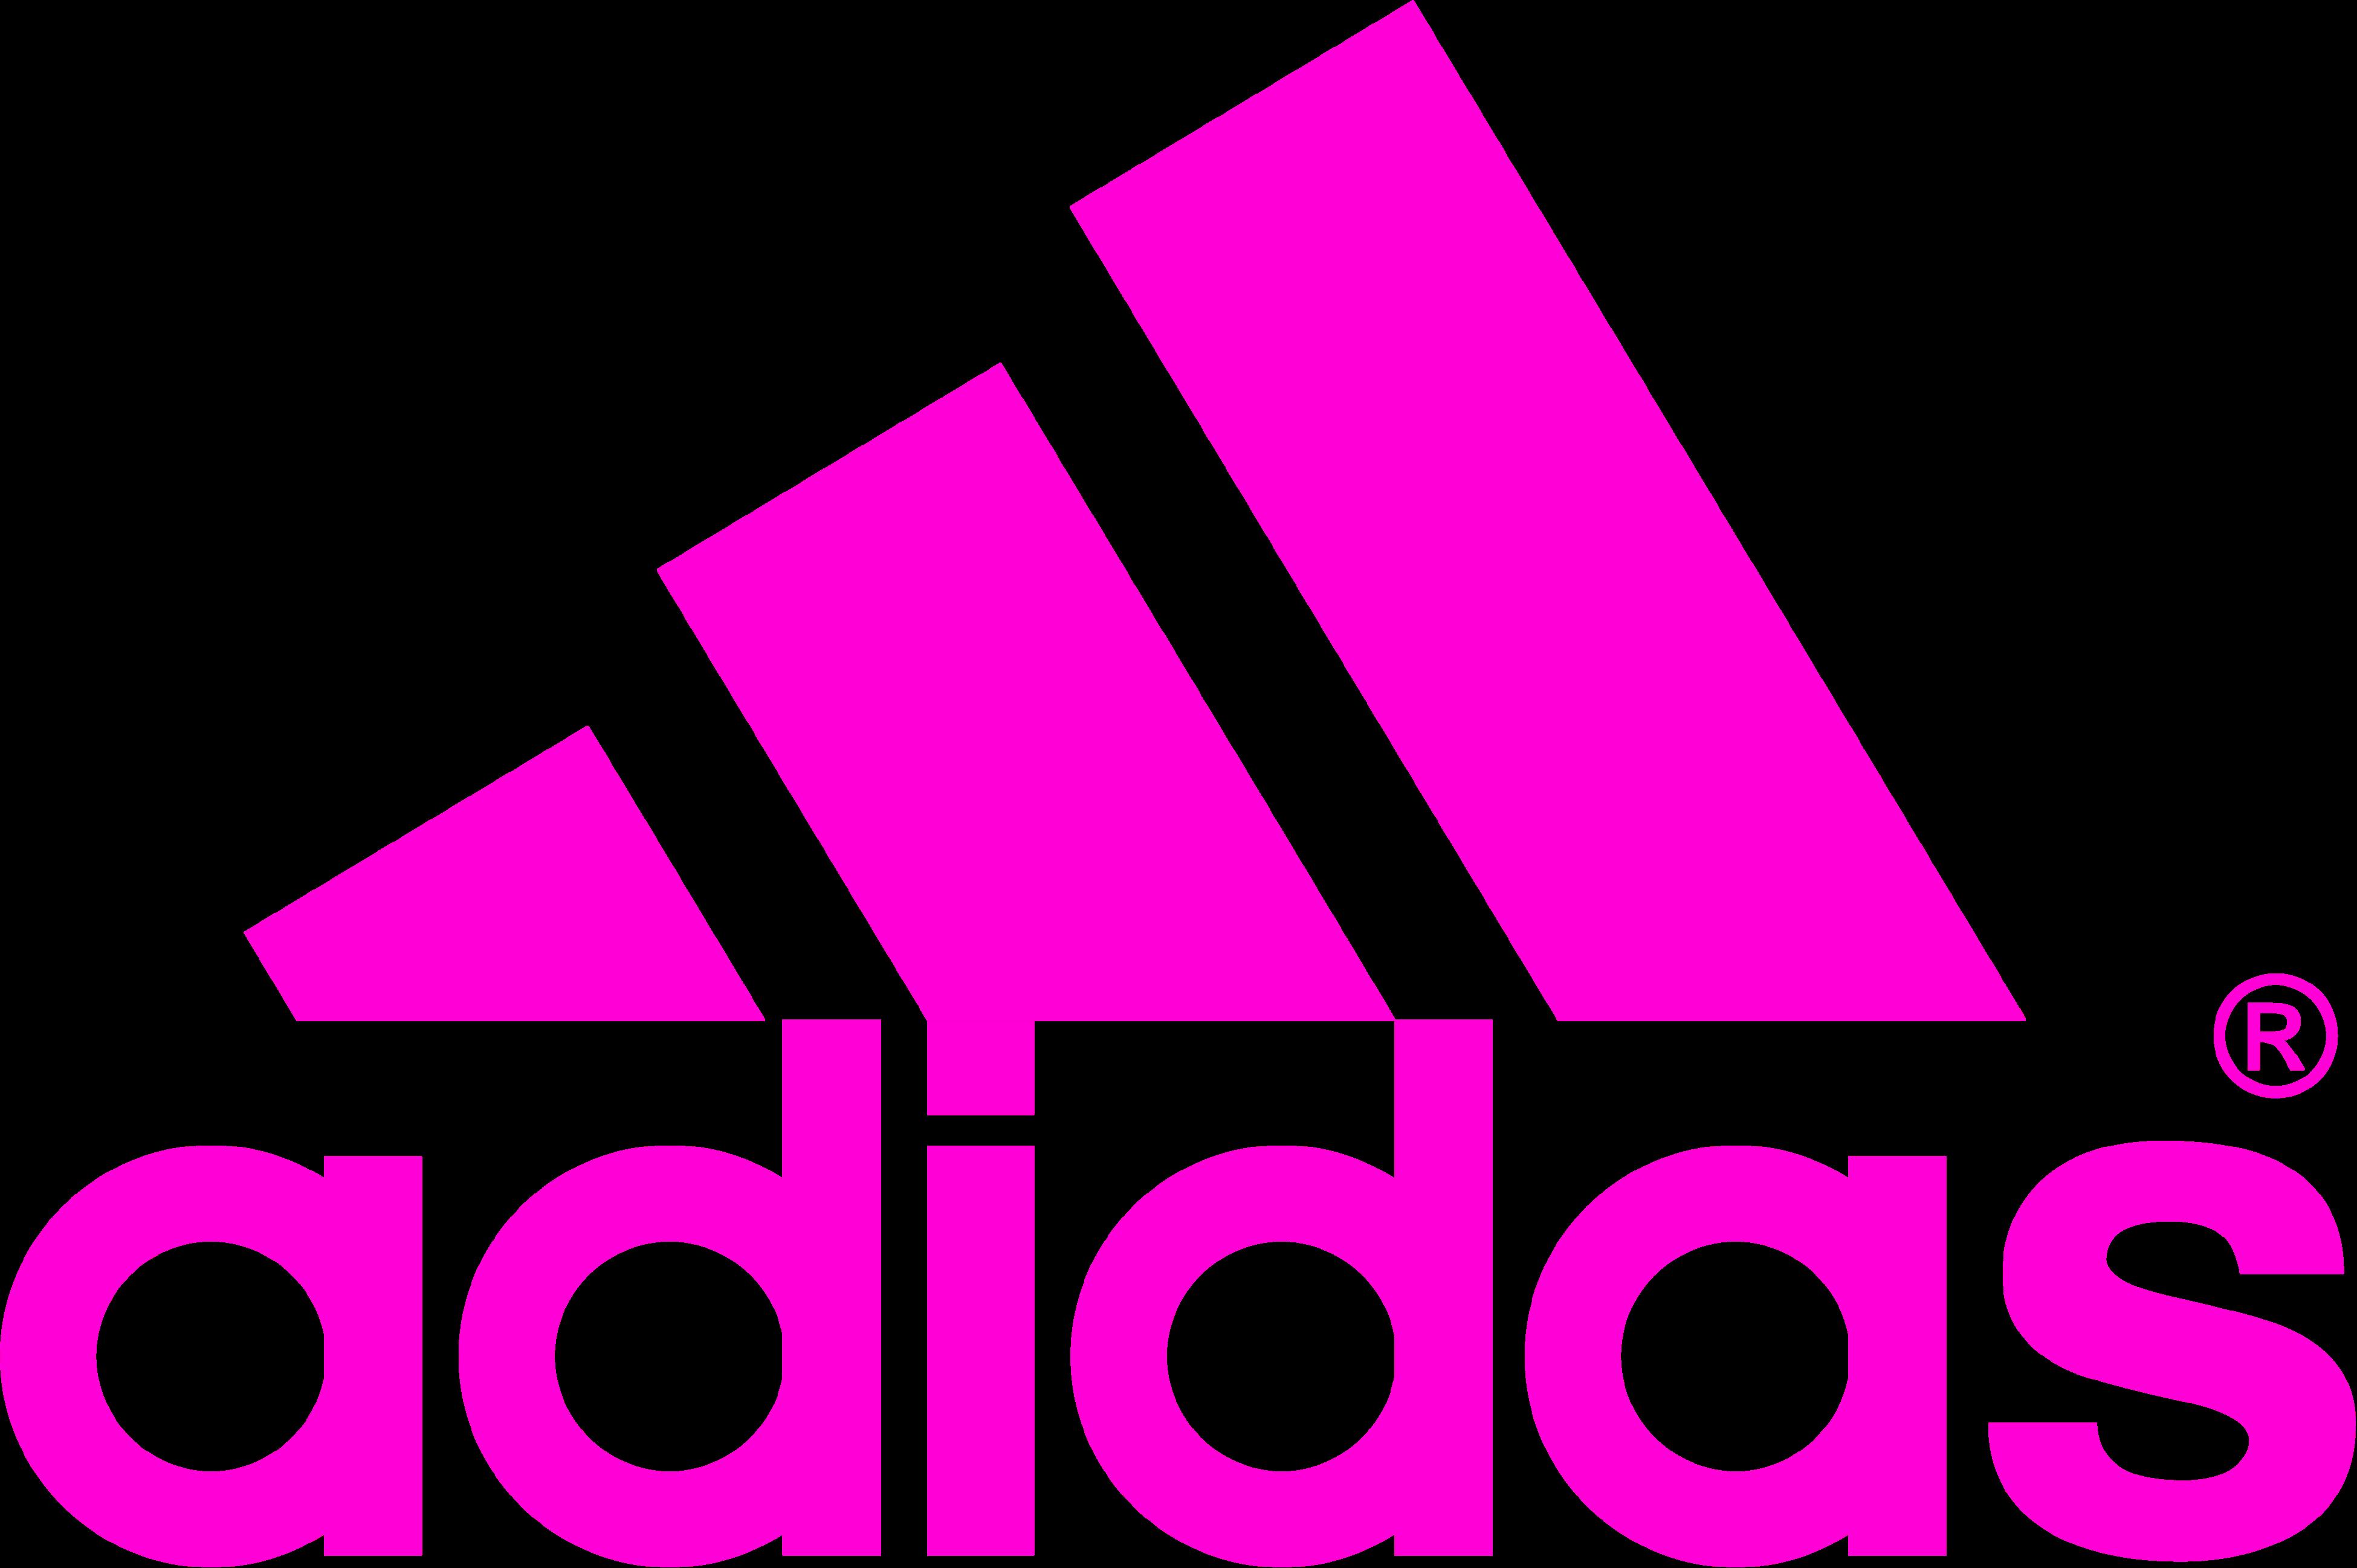 3900x2595 Adidas Logo Png Images Free Download